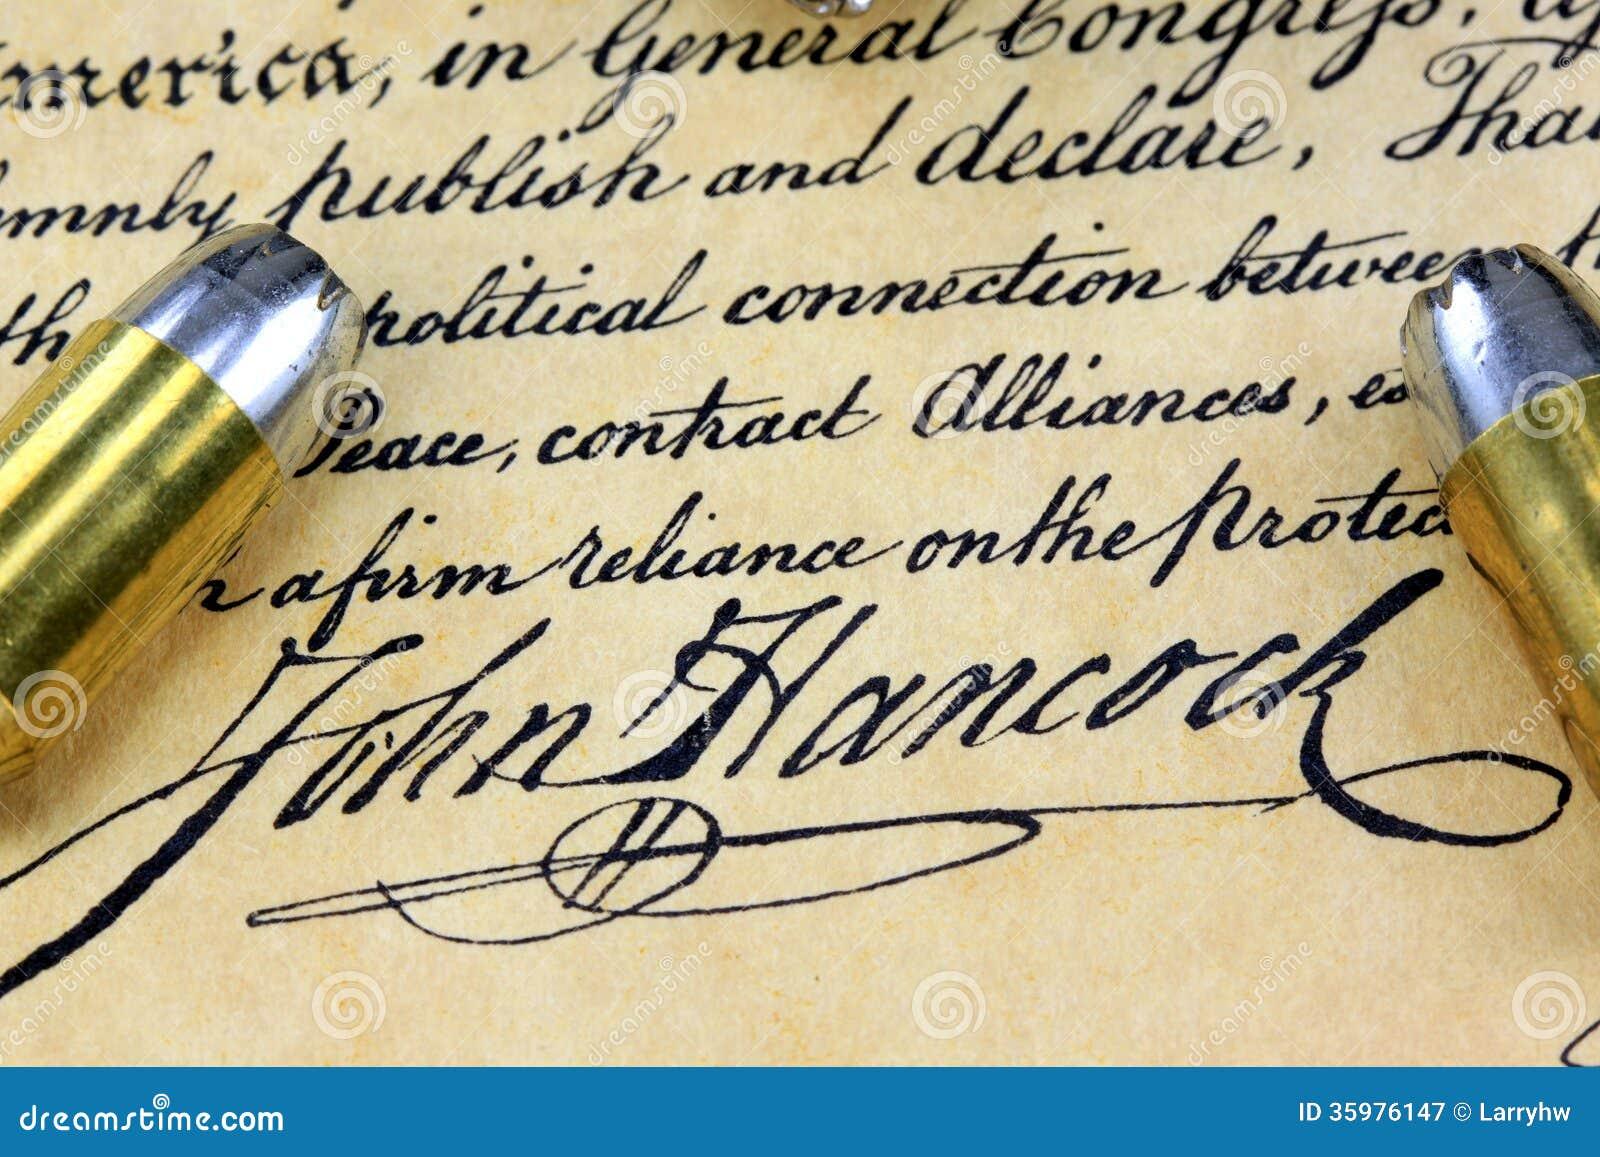 john hancock s signature ammunition on us constitution english bill of rights clipart First Amendment Clip Art